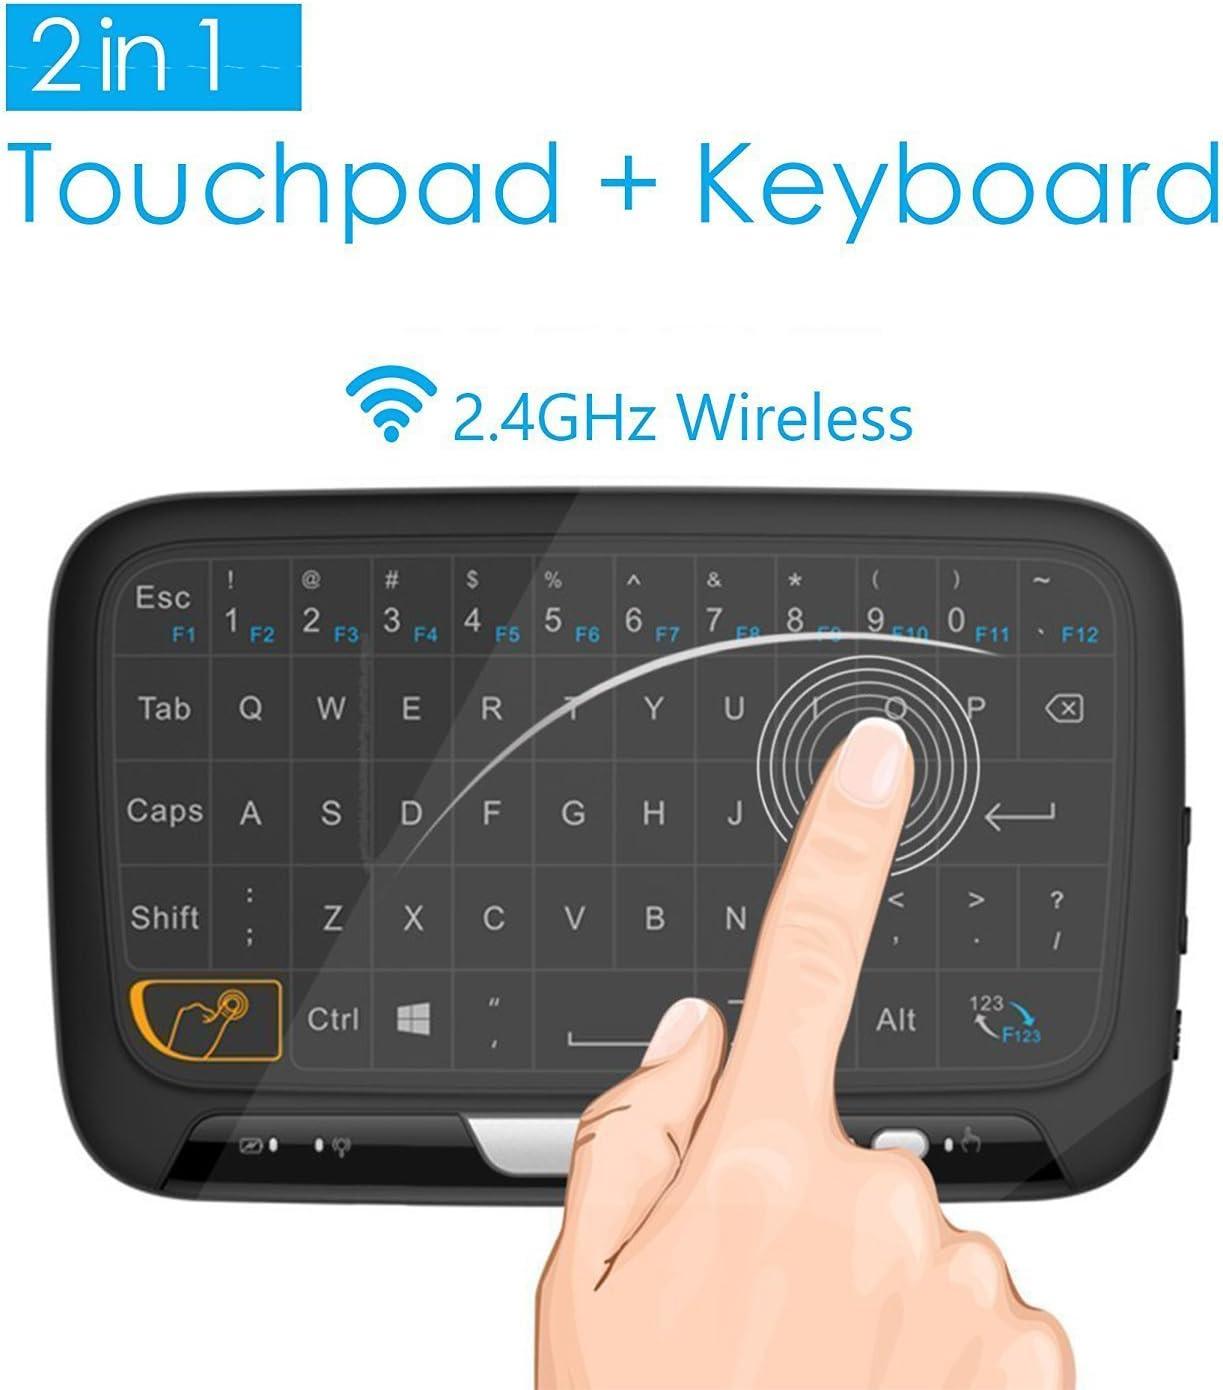 Mini Teclado Inalámbrico portátil ergonómico con touchpad (RF 2.4 GHz, USB), Compatible con SmartTV, Mini PC, TV inteligente, Android TV BOX, PC, Caja de juegos, Notebook: Amazon.es: Electrónica